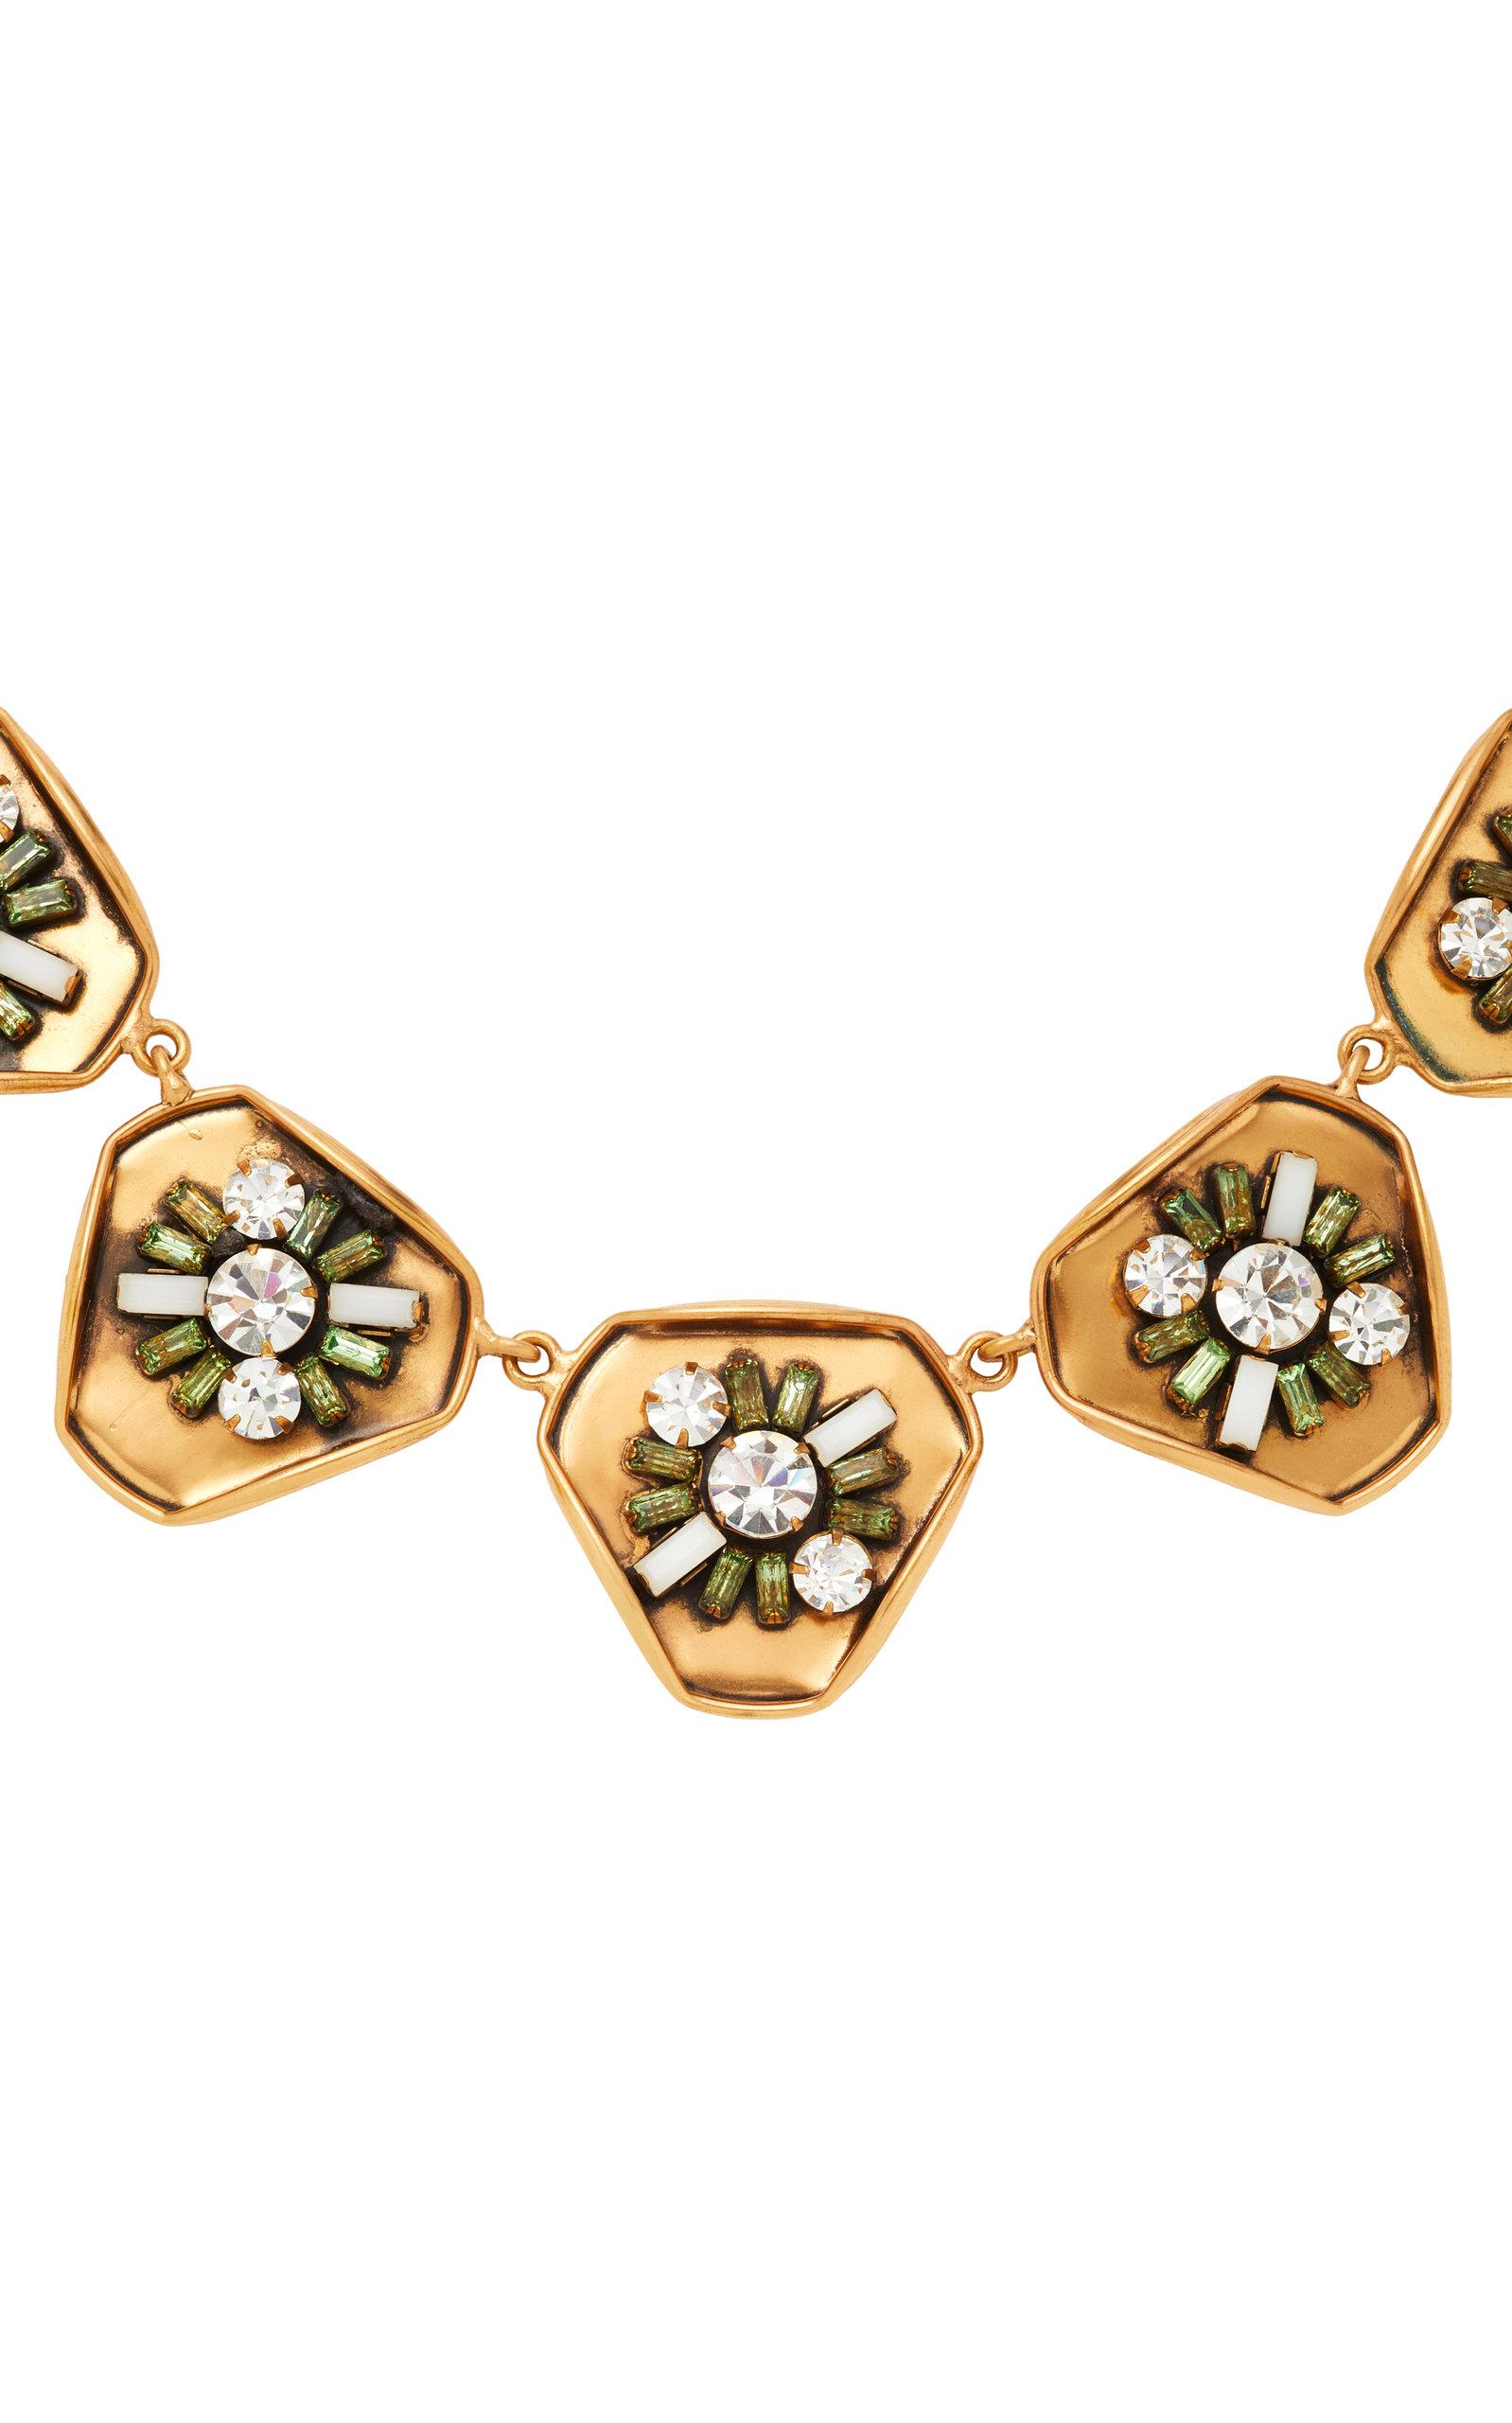 Gold-Plated Swarovski Crystal Necklace Nicole Romano 2ESOB